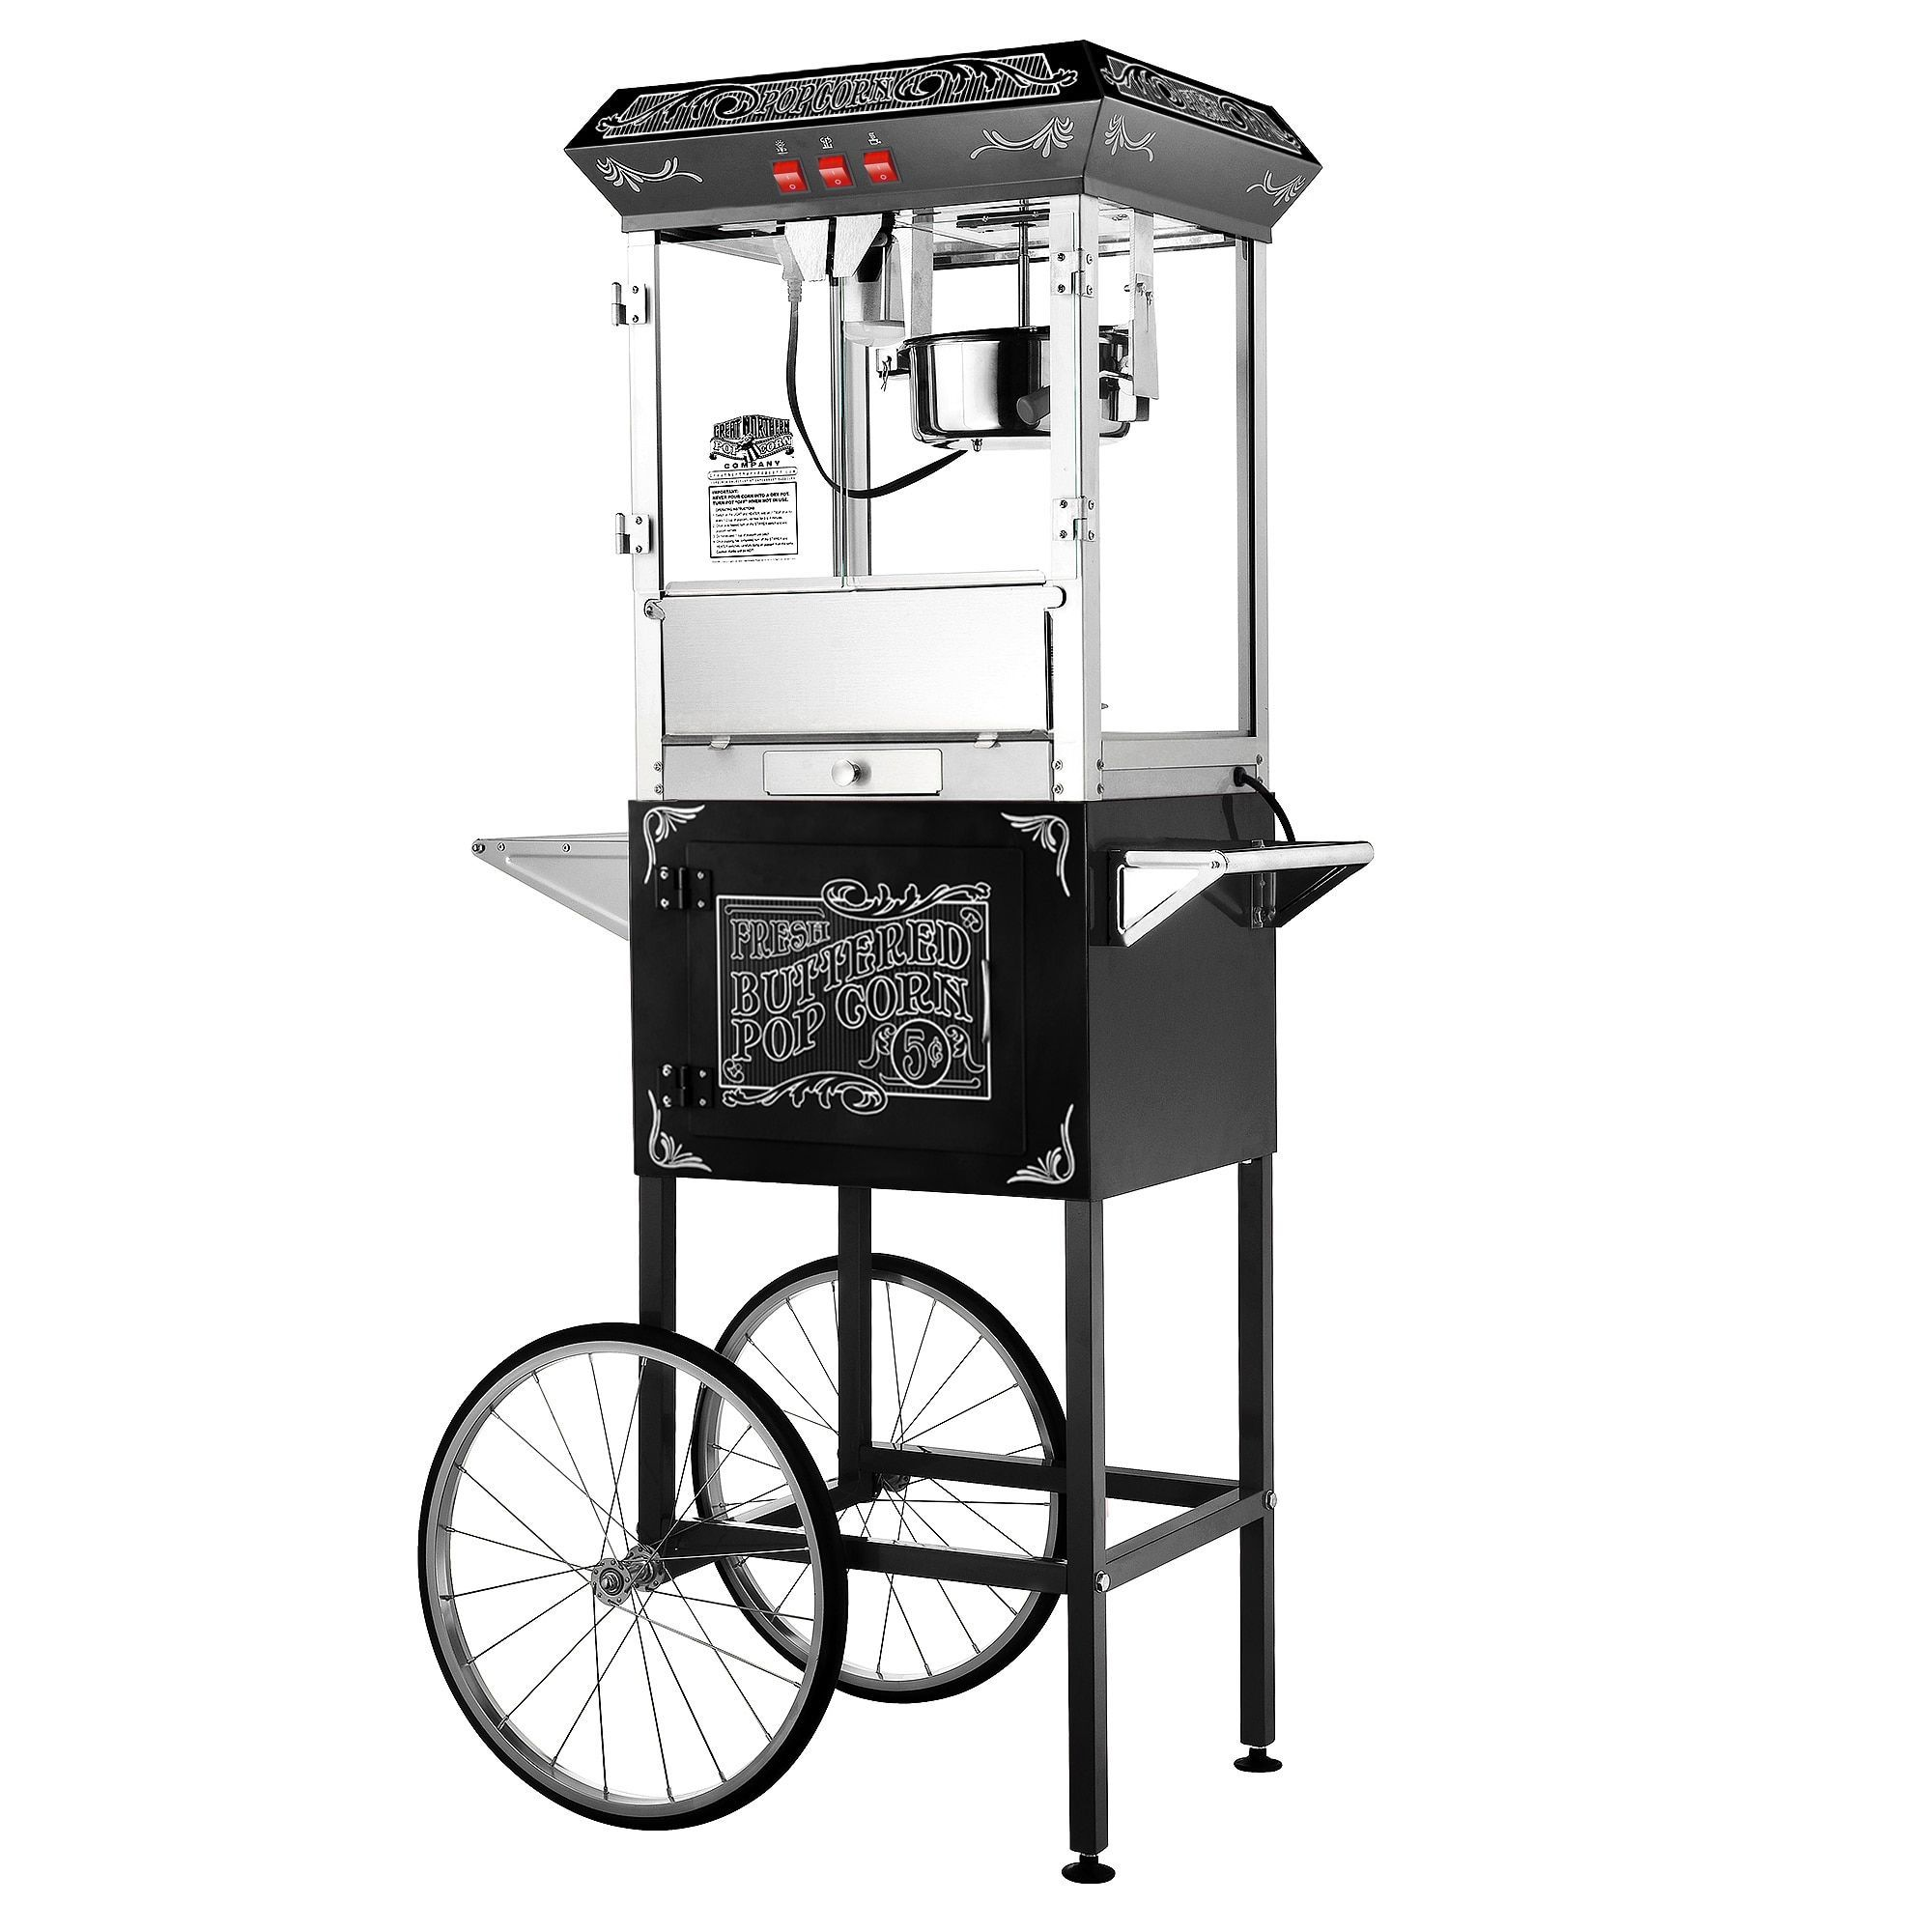 Popcorn Machine Drawing